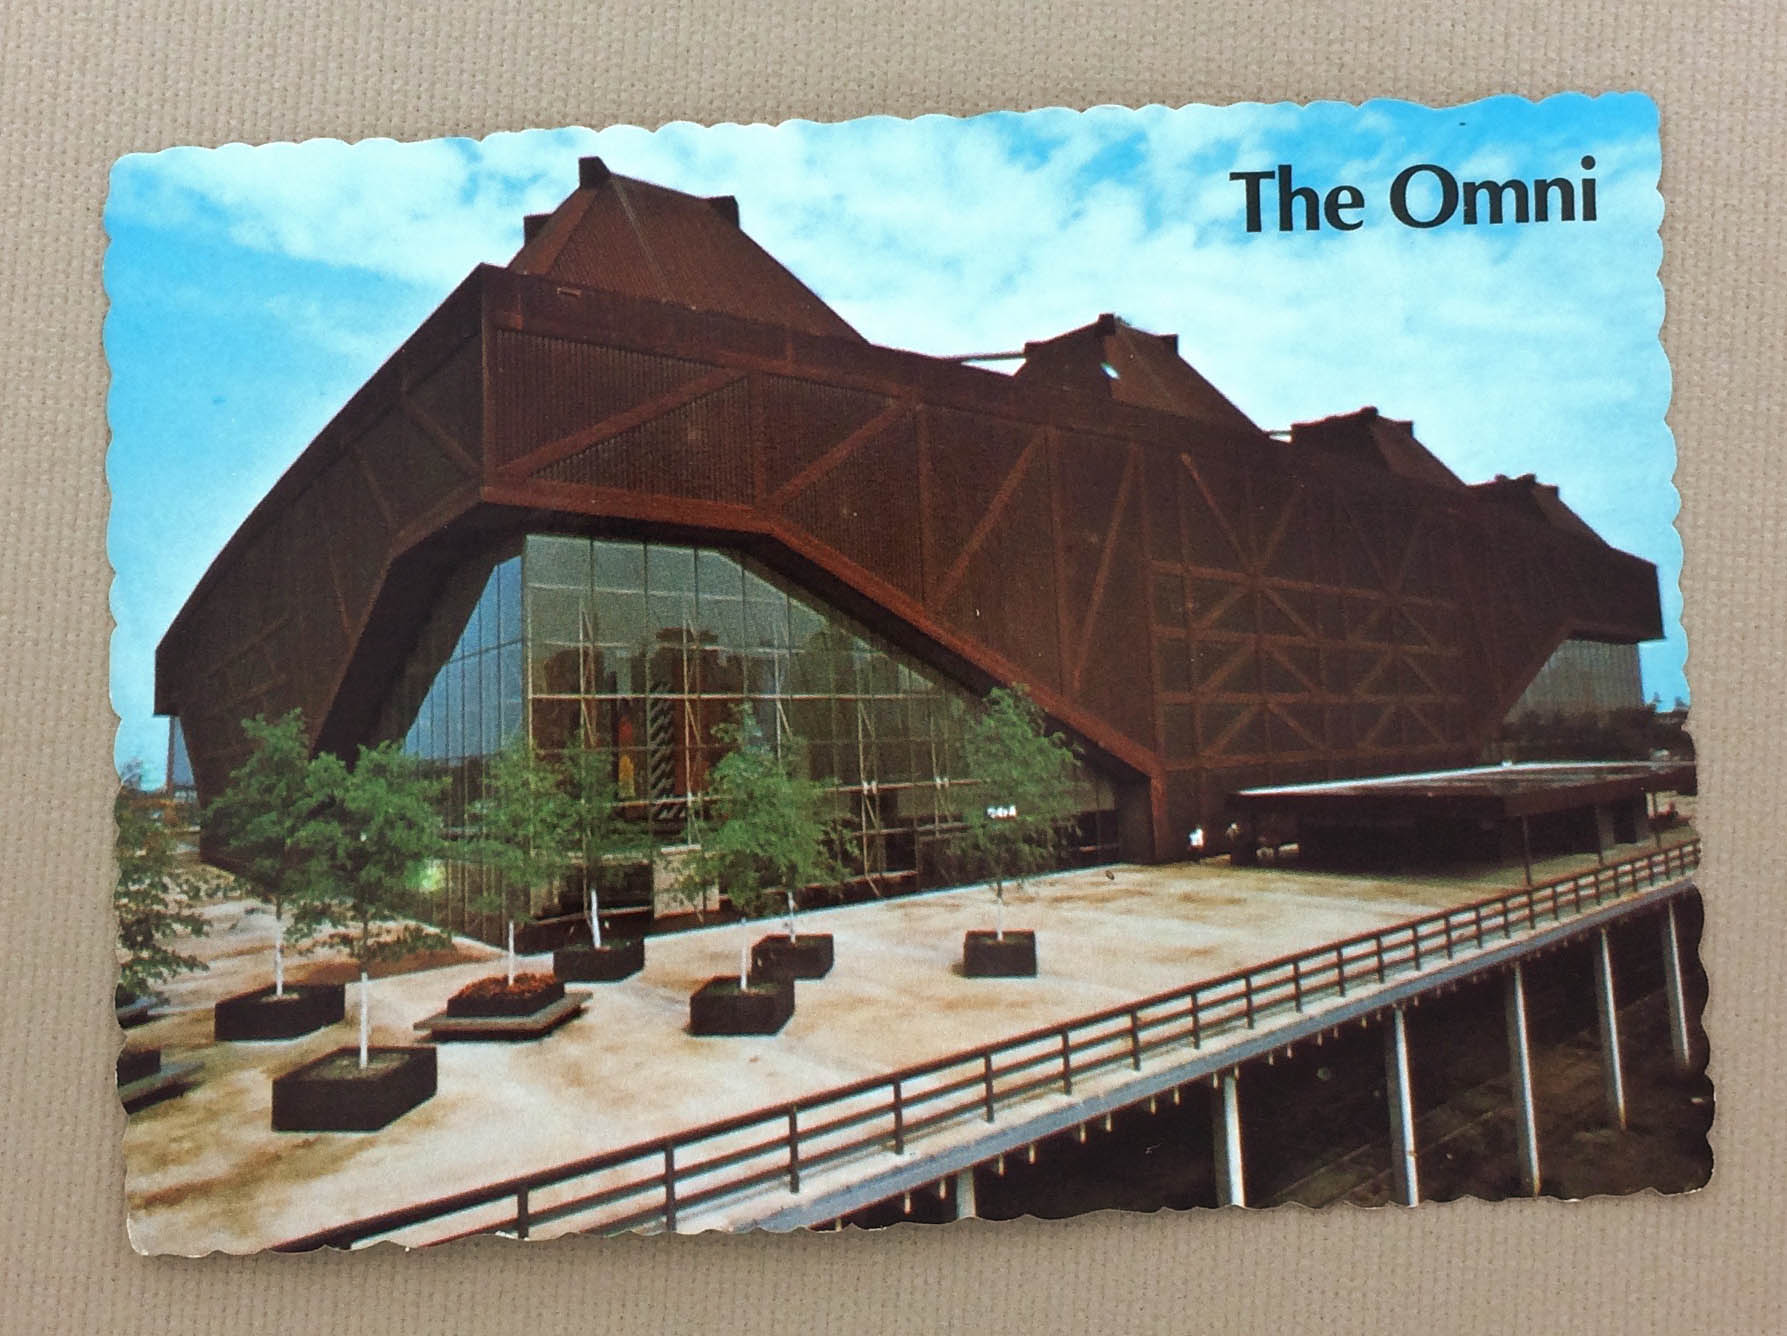 The Omni Coliseum